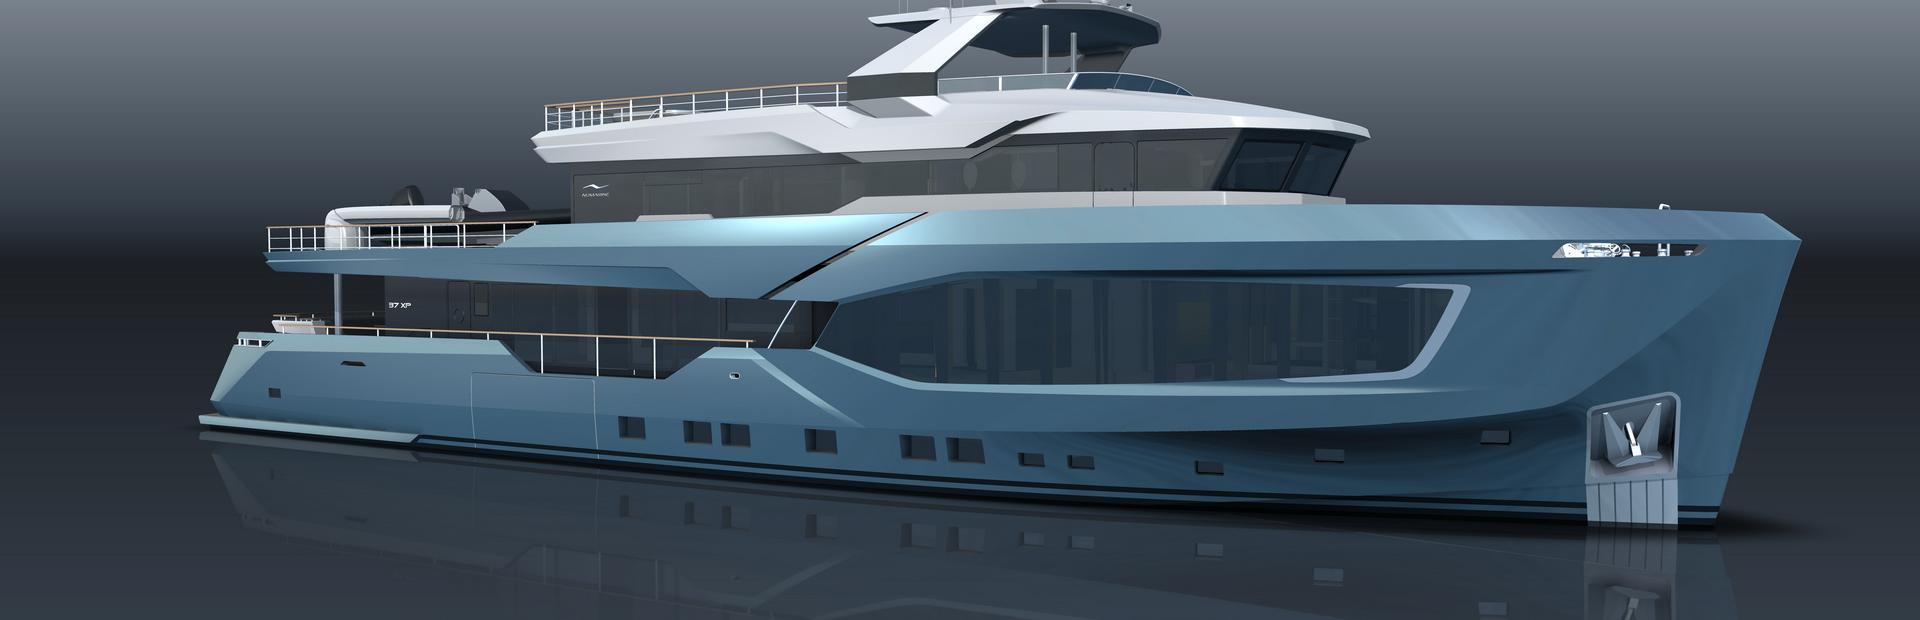 37 XP Yacht Charter